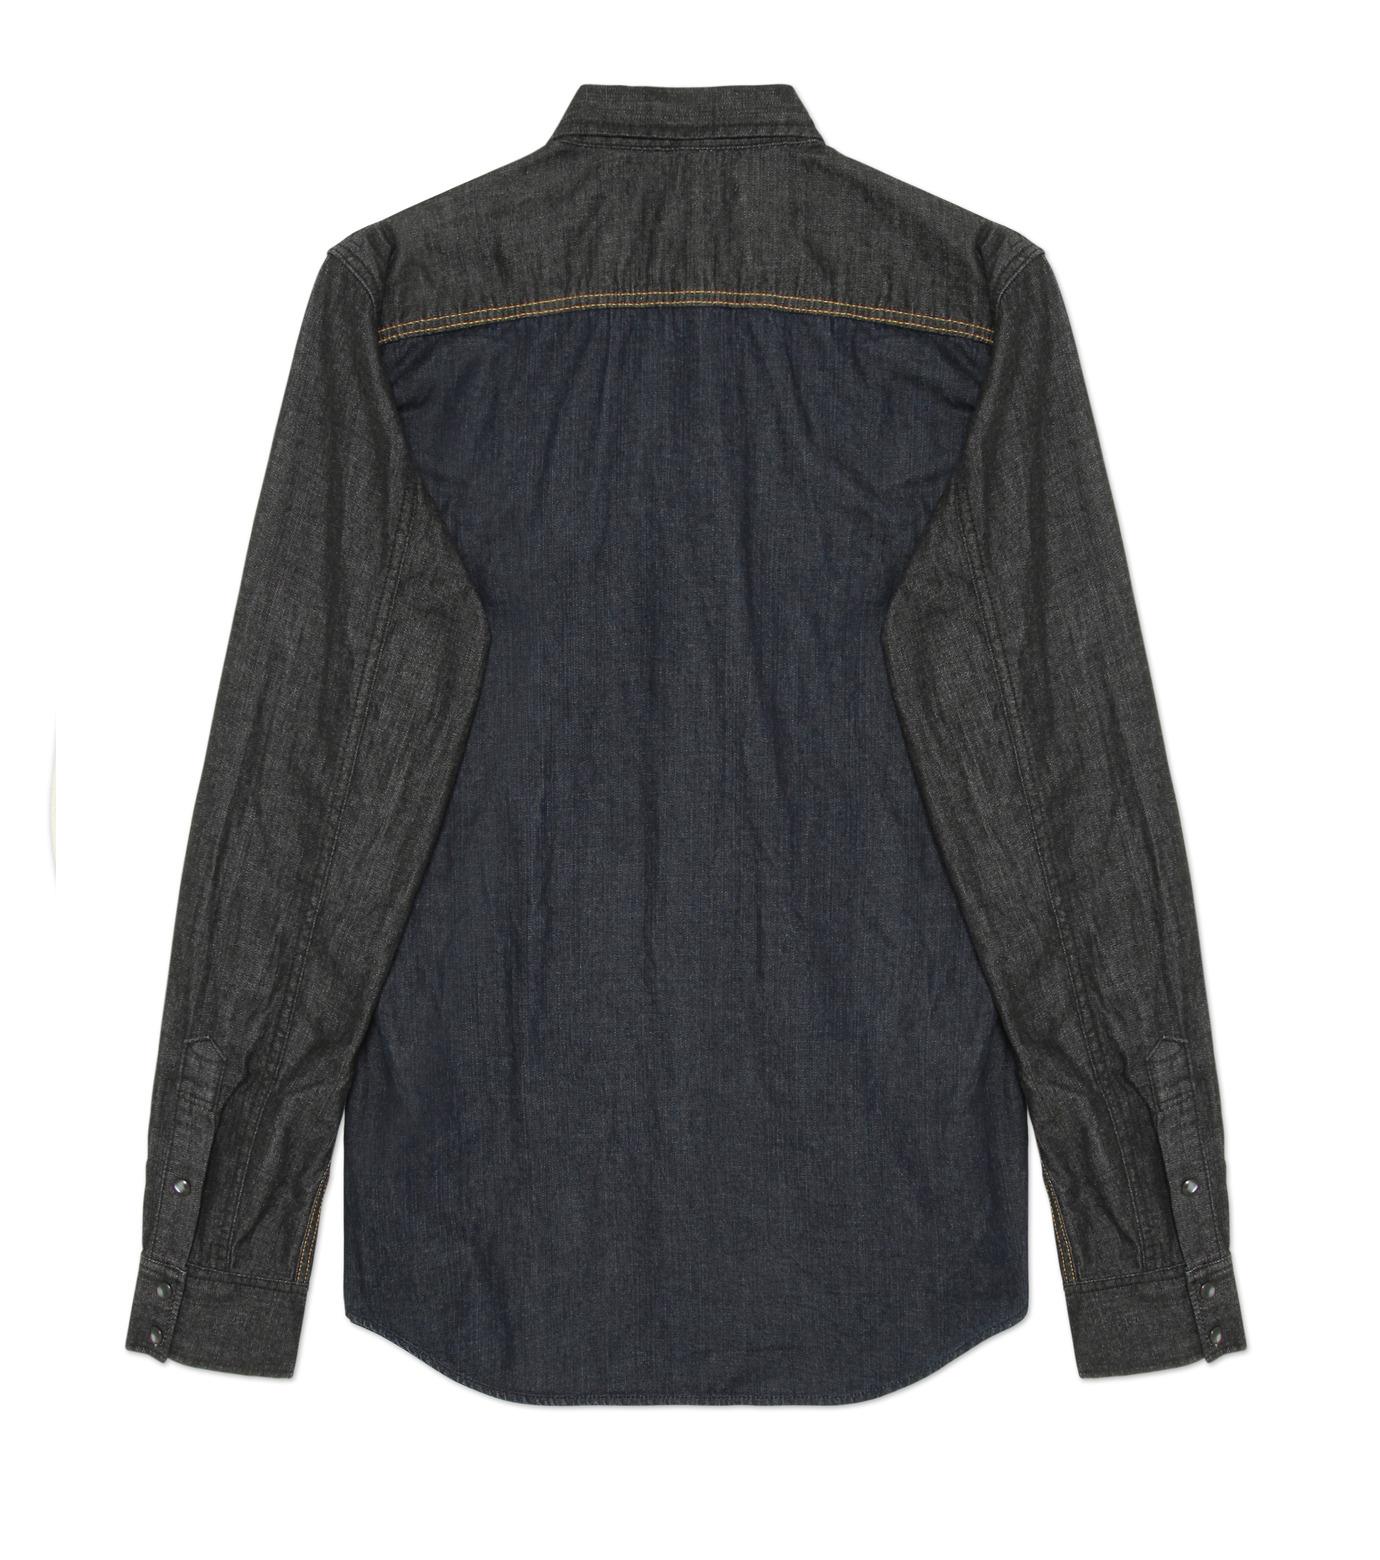 HL HEDDIE LOVU(エイチエル・エディールーヴ)のHL DENIM SHIRT-BLACK(シャツ/shirt)-17A93003-13 拡大詳細画像2